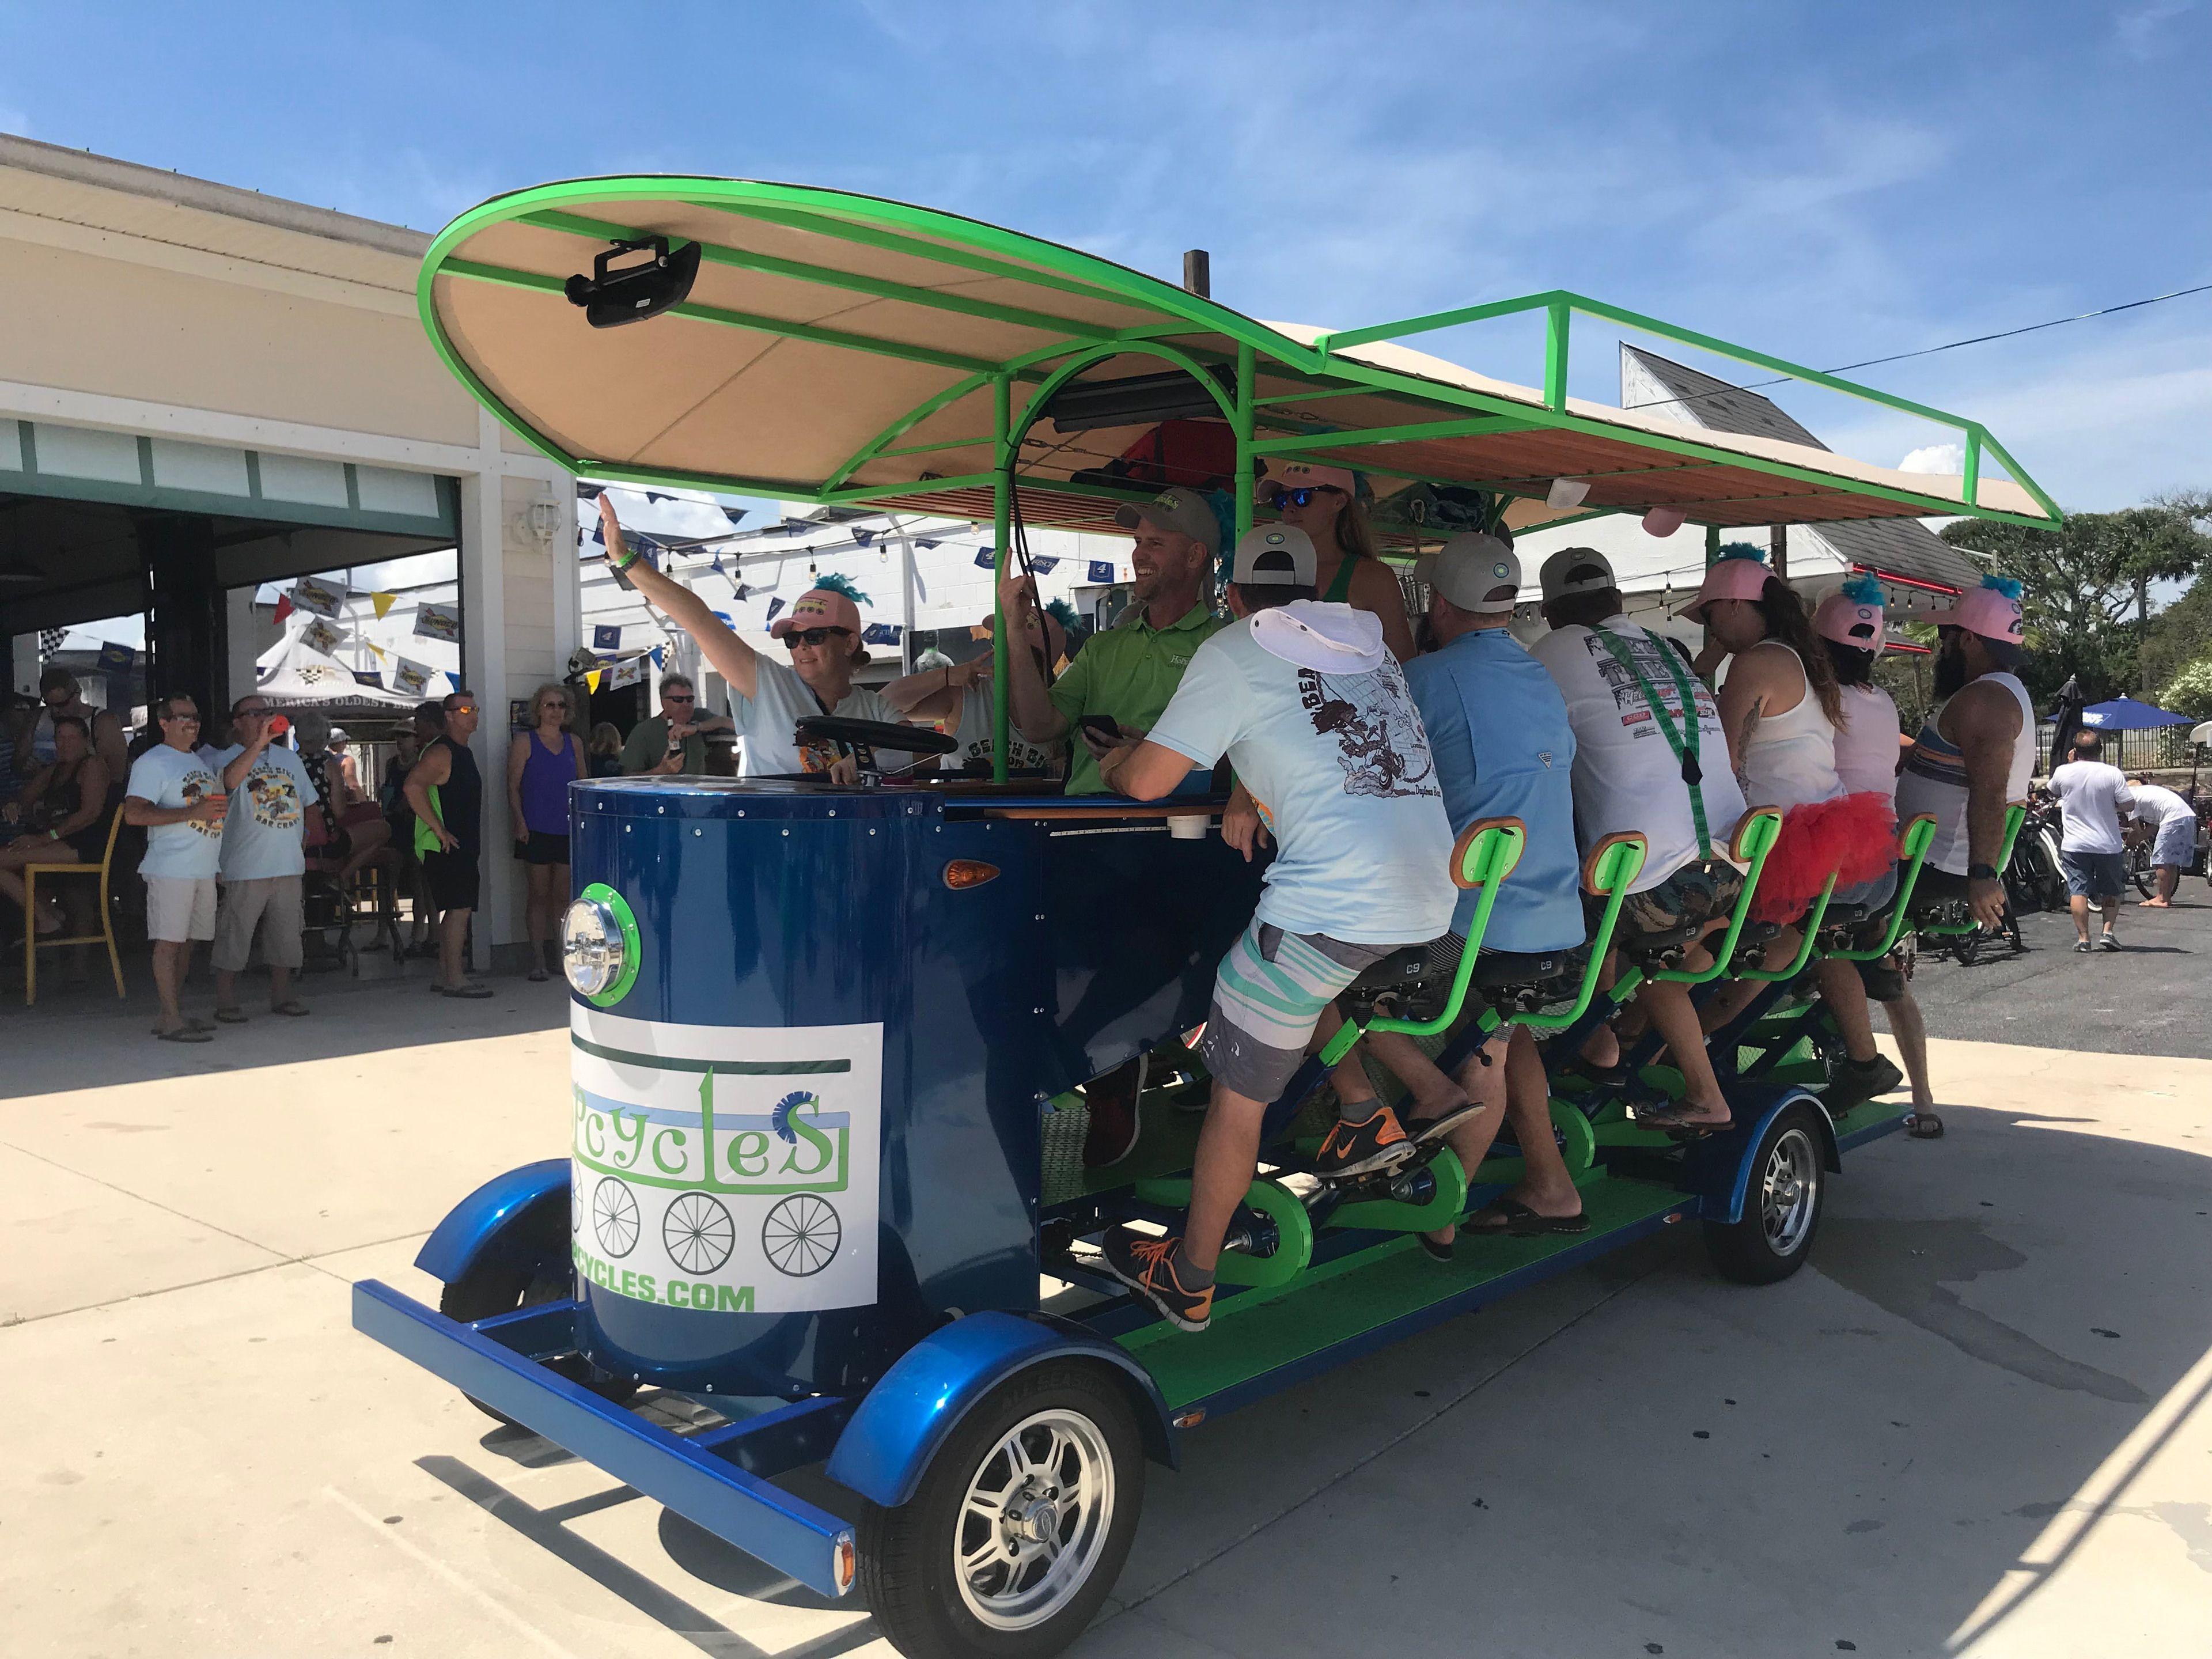 Hopcycles BYOB Pub Crawler Tour for 8-15 People